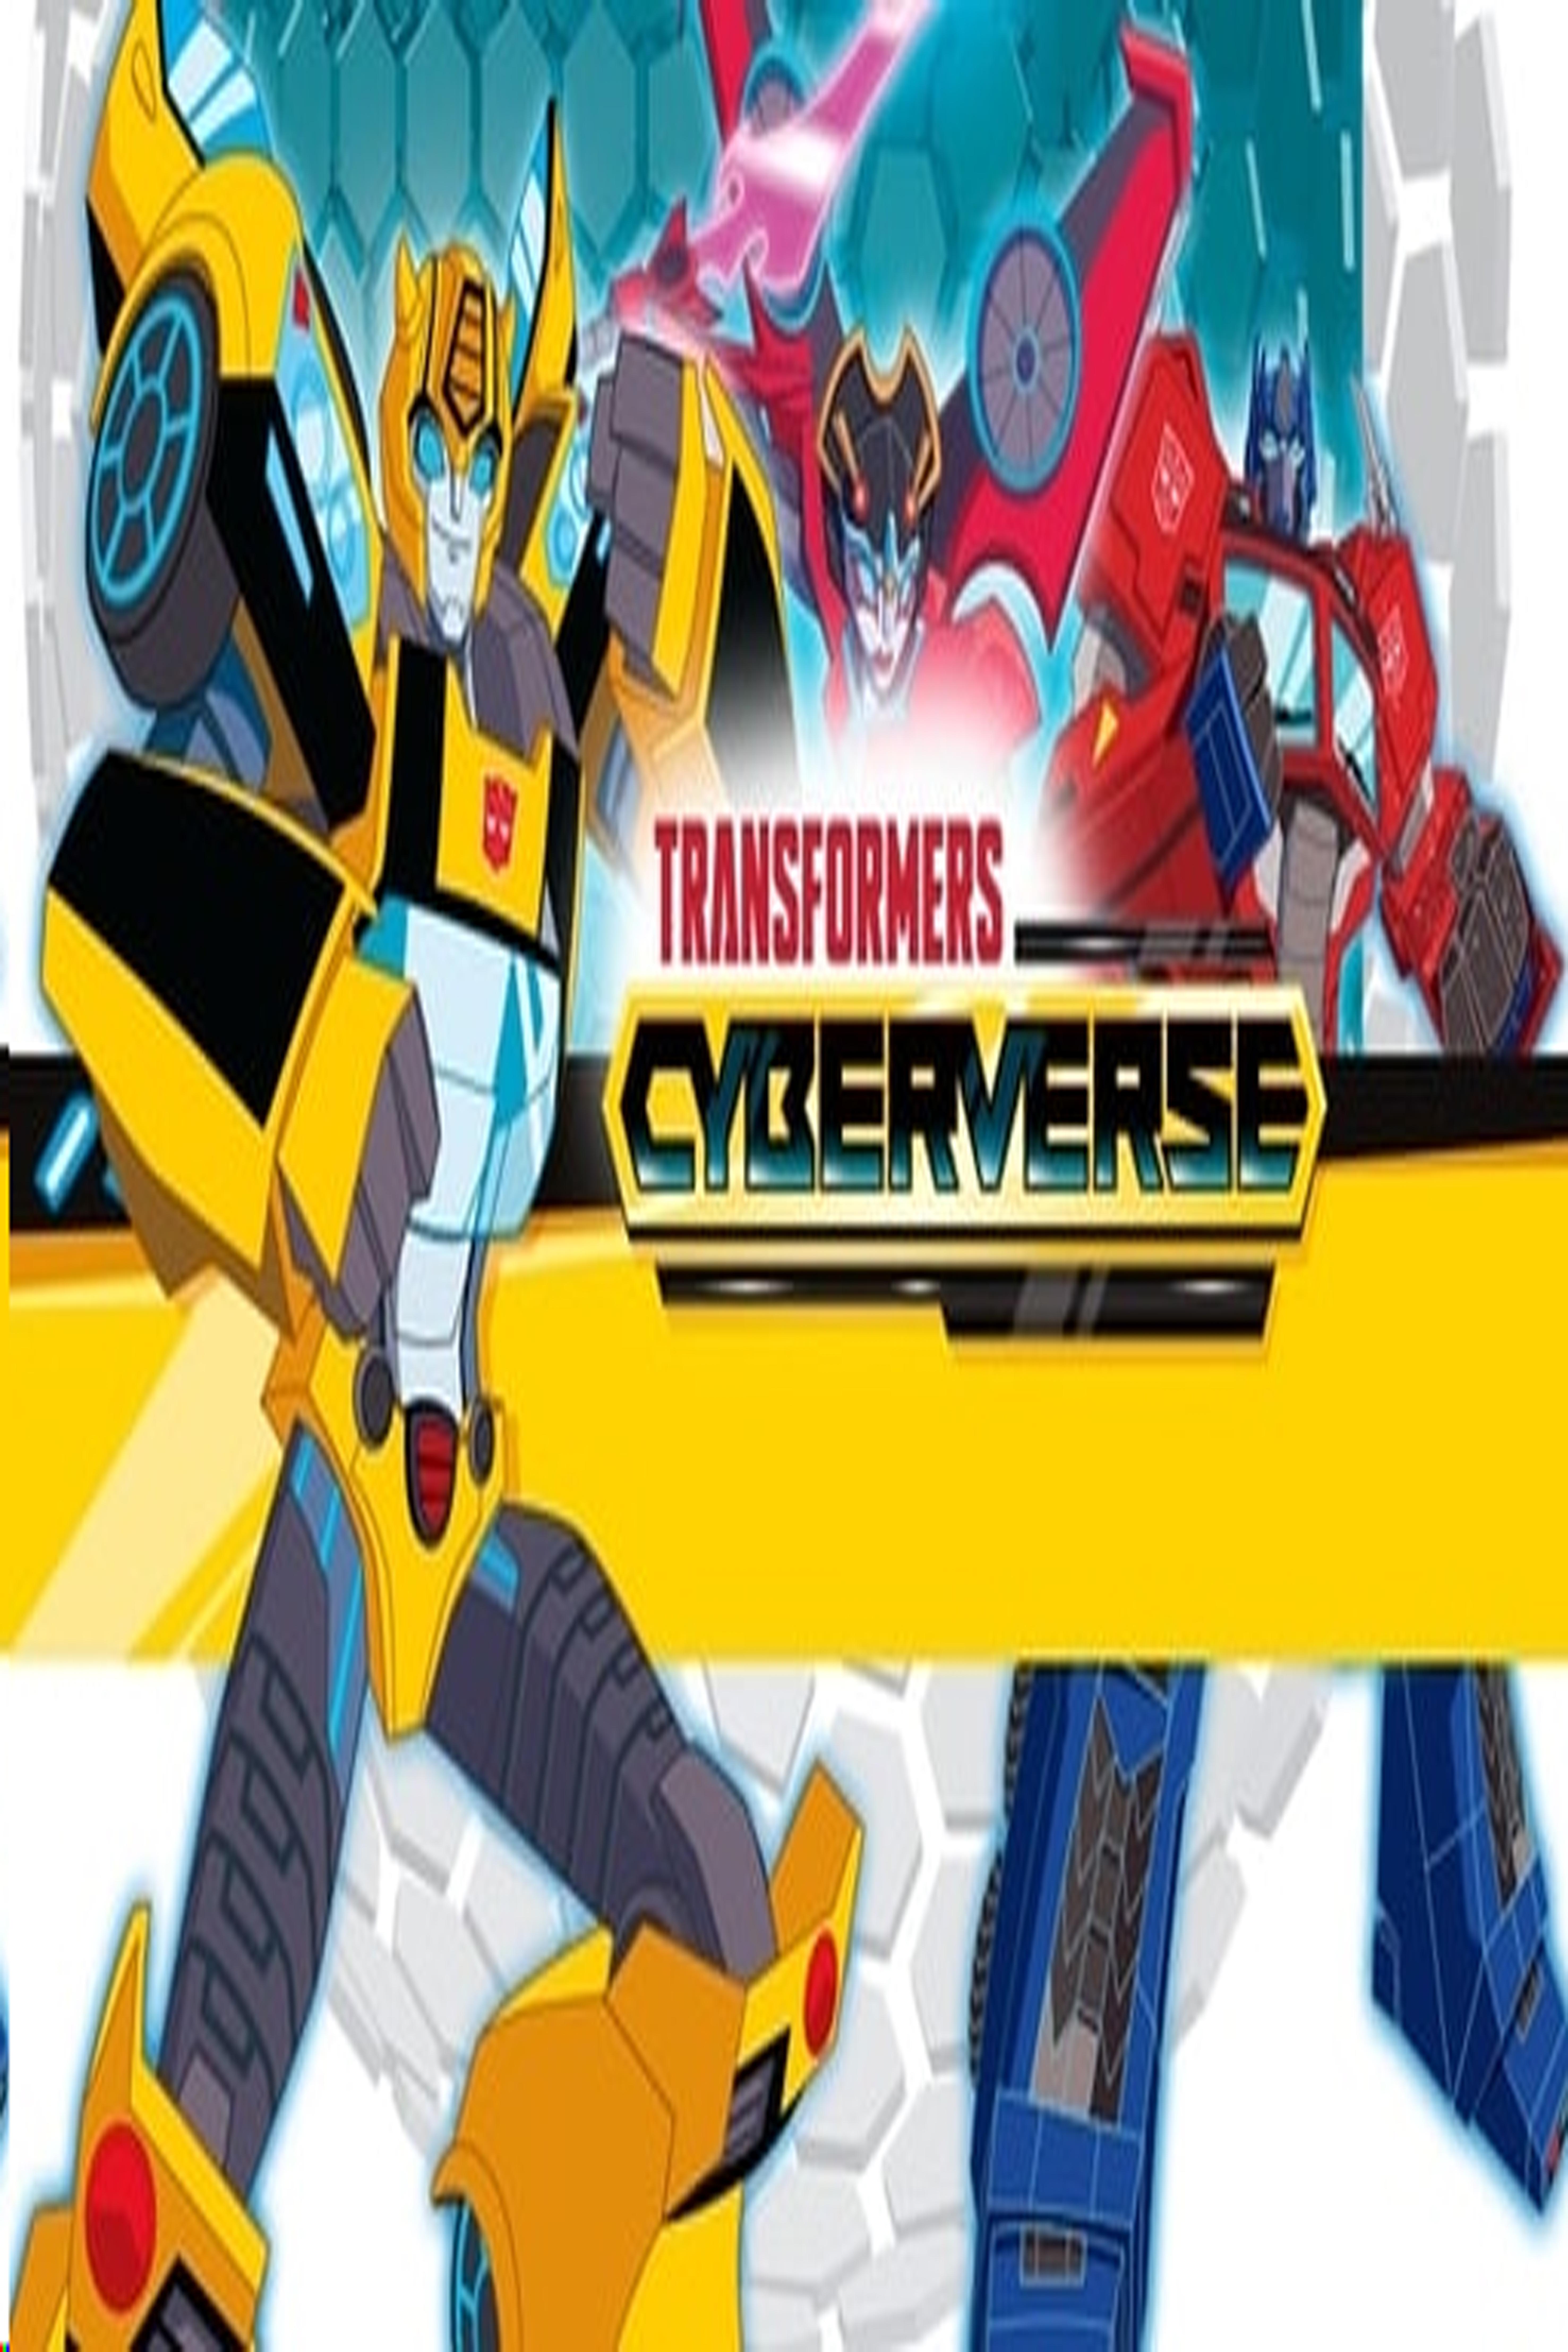 Transformers Cyberverse Season 1 - 變形金剛 斯比頓傳奇